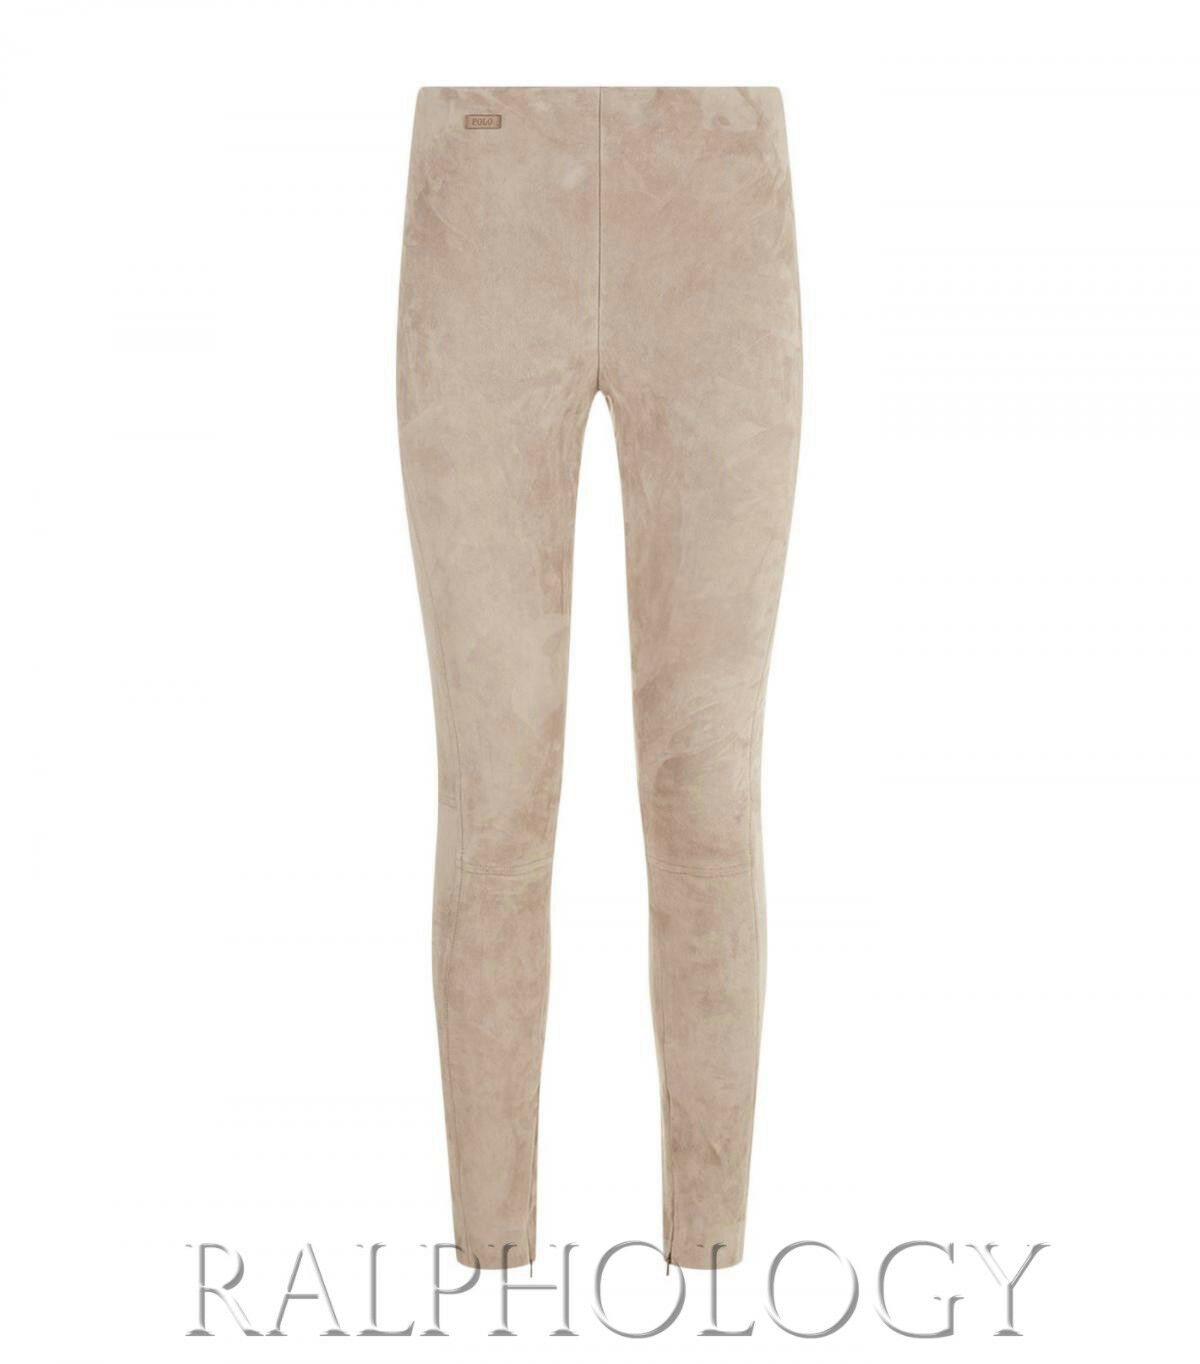 998 Polo Ralph Lauren damen Taupe Leather Suede Leland Legging Pant Pants NWT